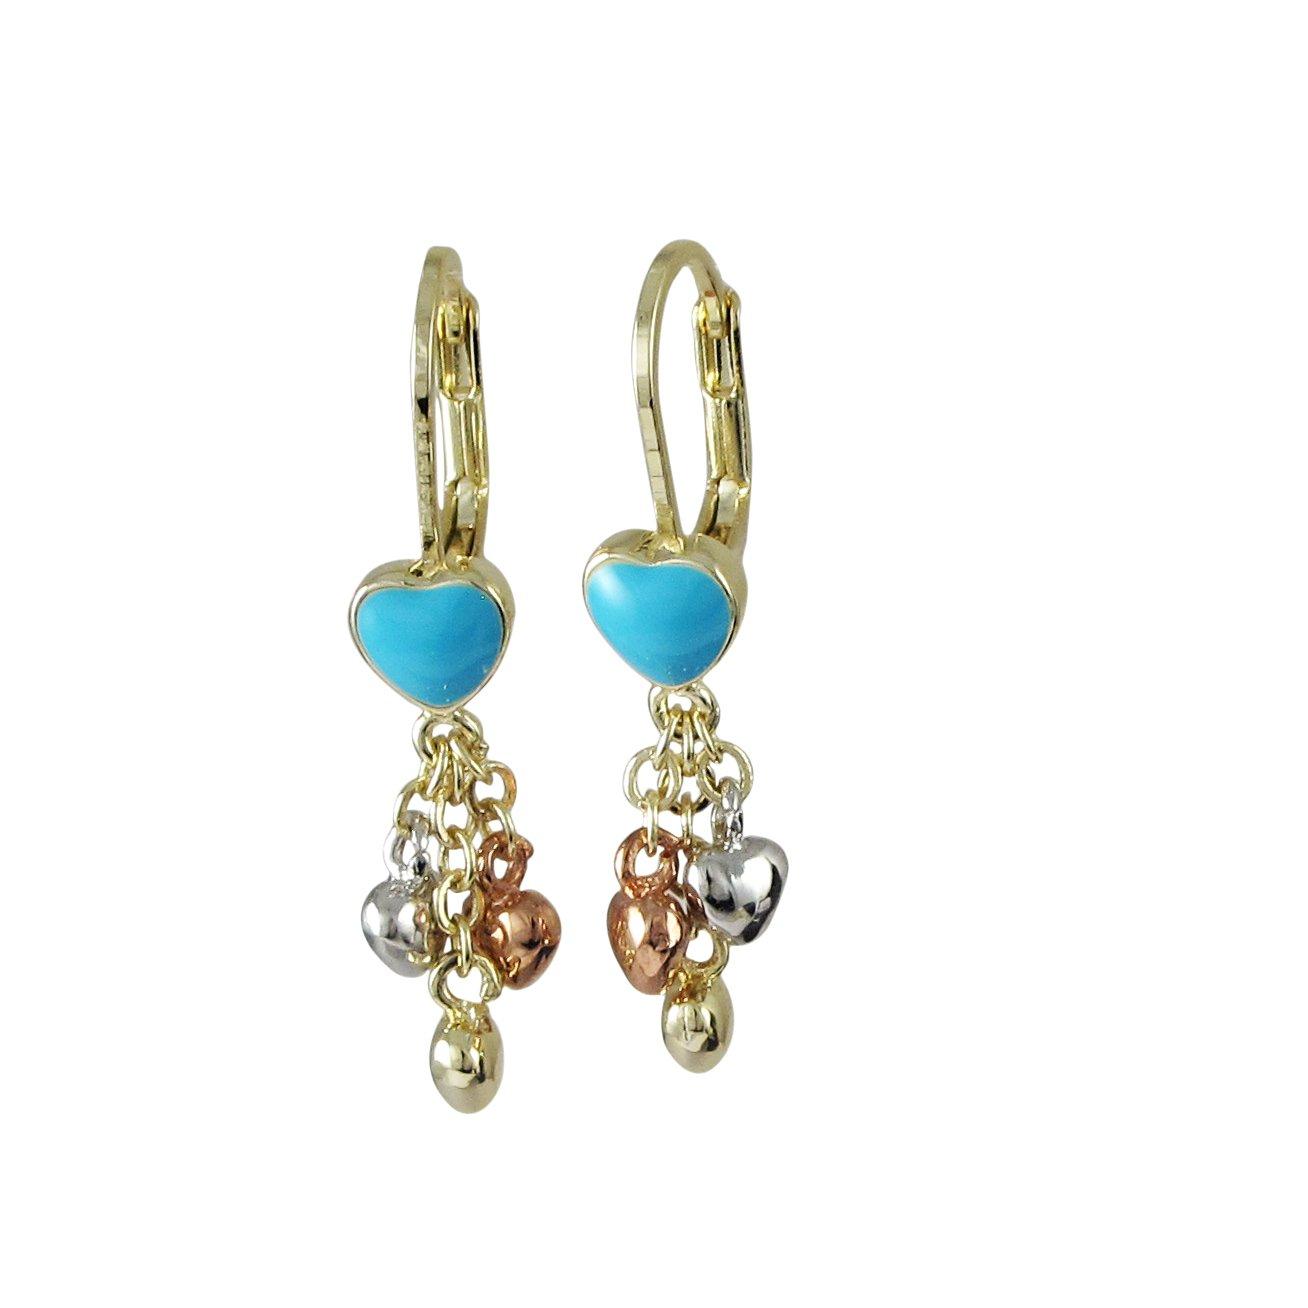 Ivy and Max Tri-color Gold Finish Aqua Blue Enamel Hearts Girls Dangle Earrings